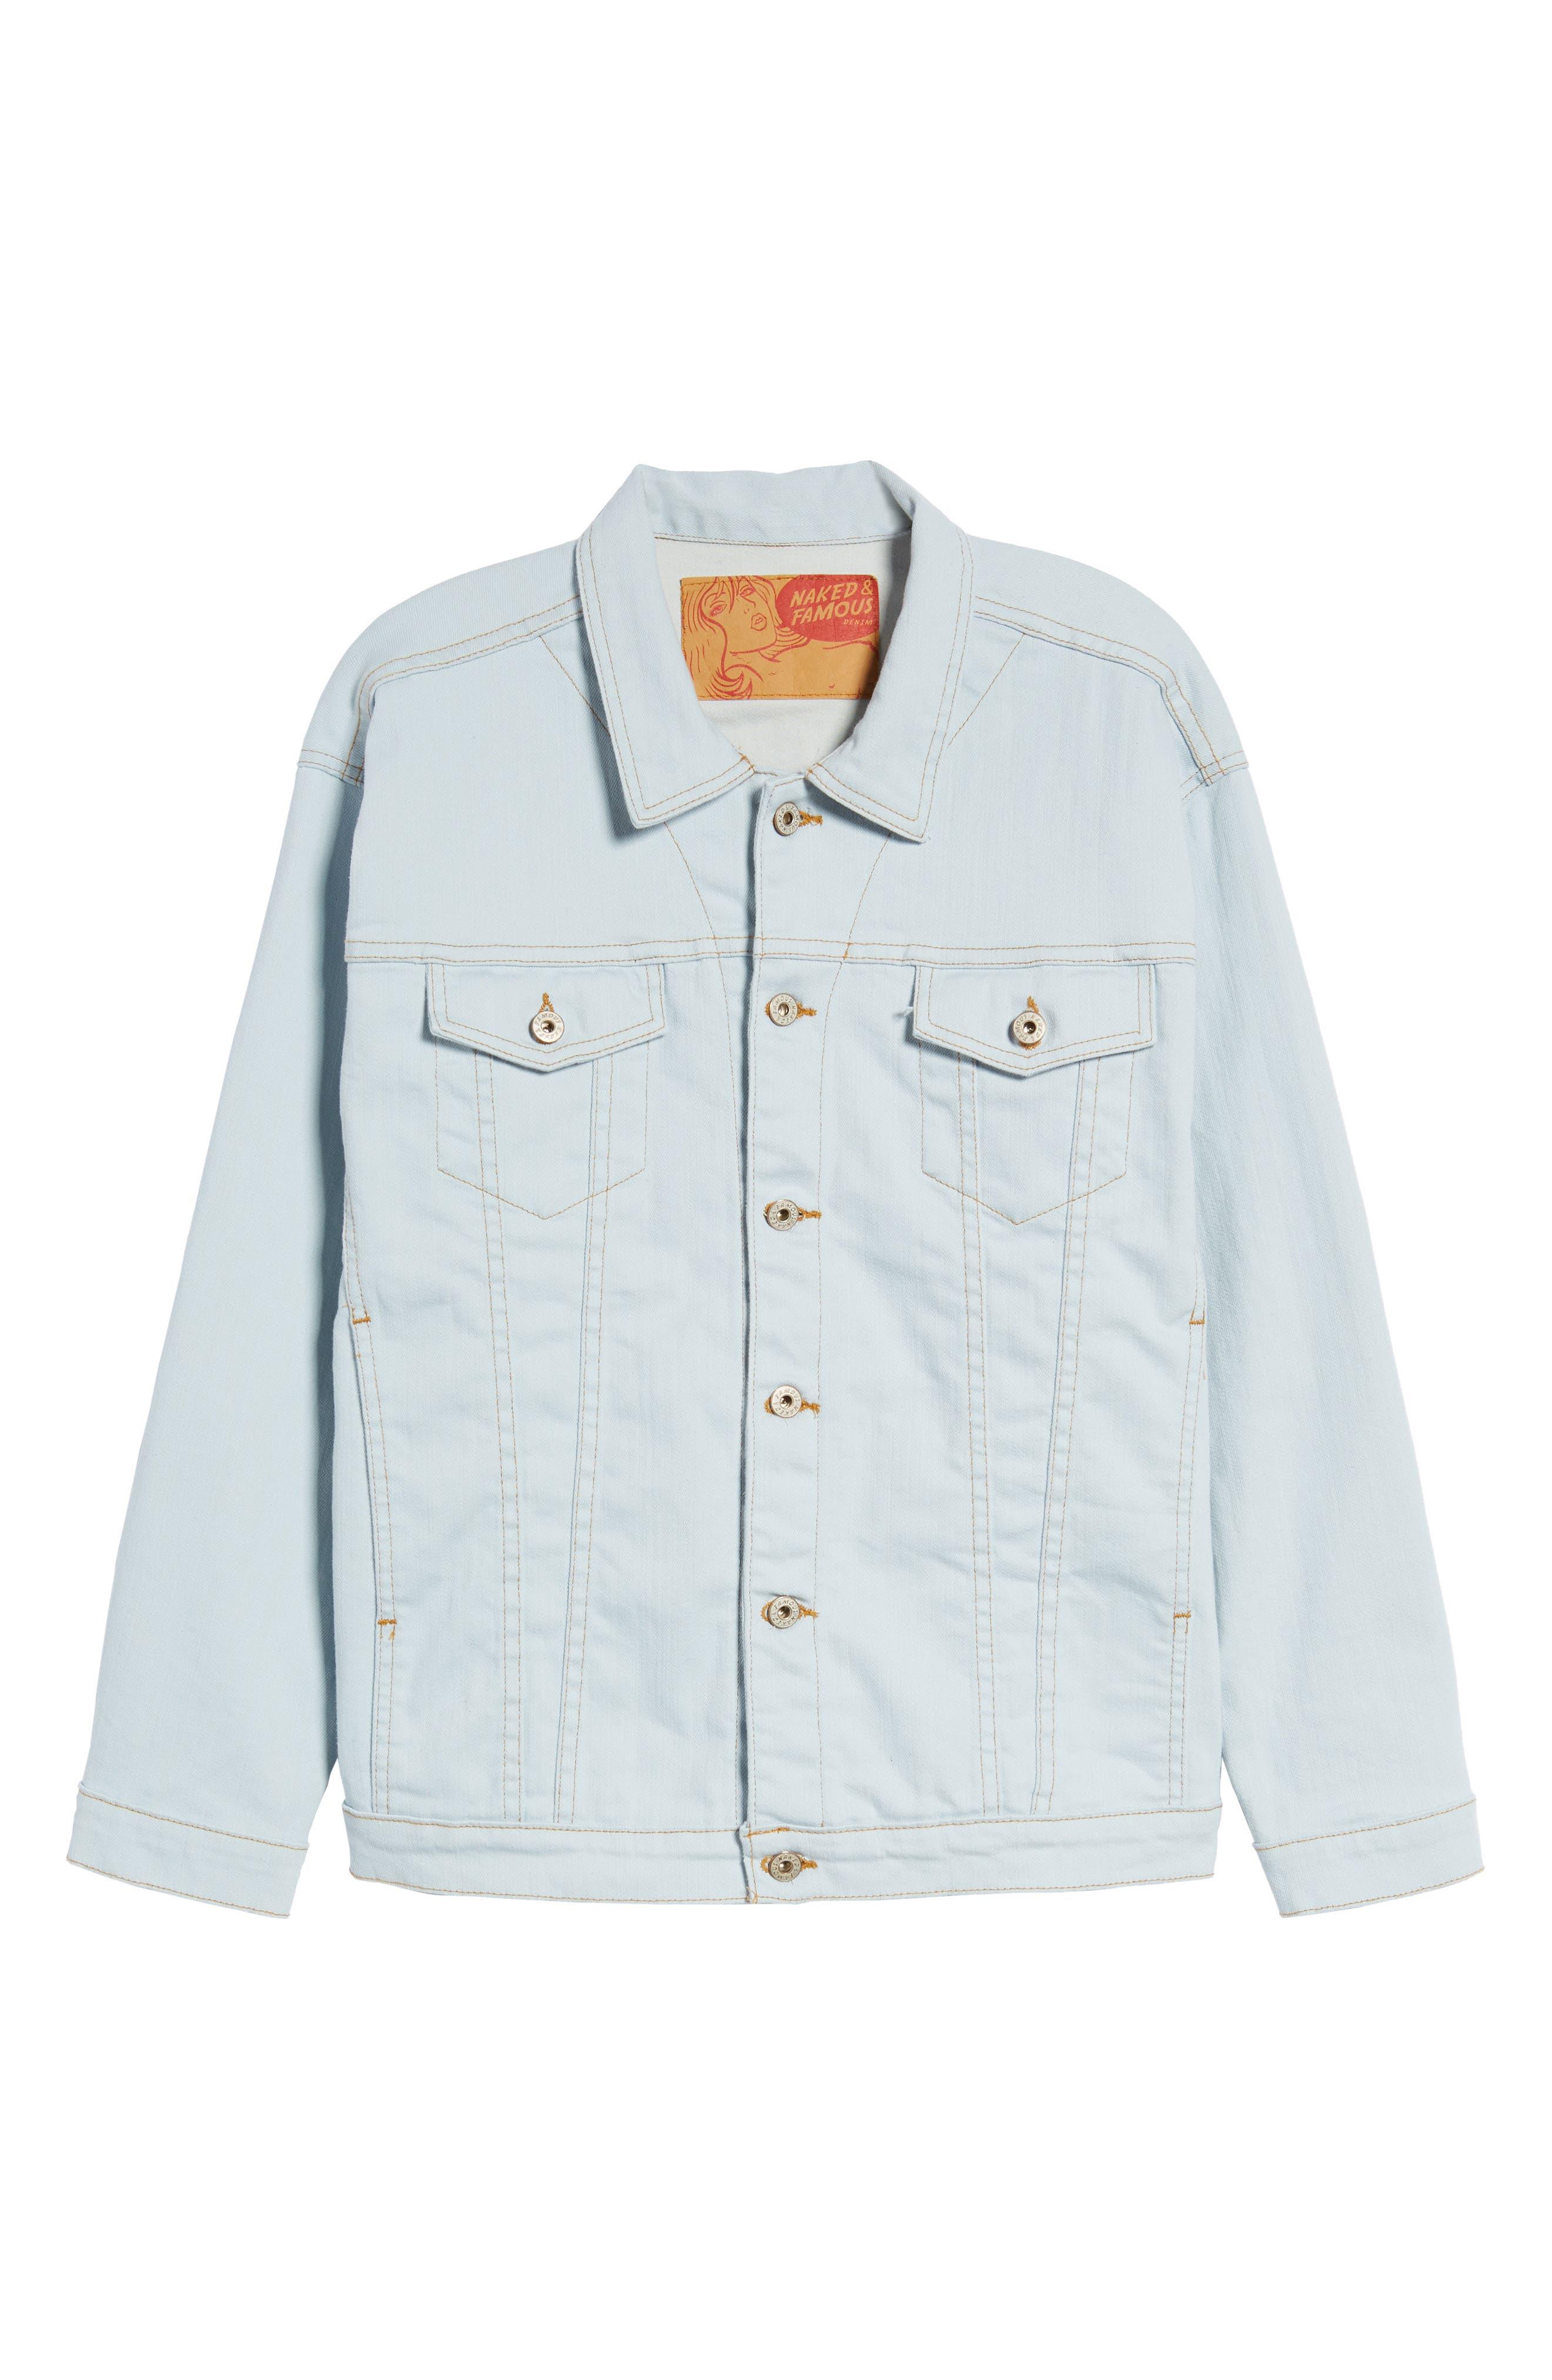 Oversize Jacket,                             Alternate thumbnail 5, color,                             Powder Blue